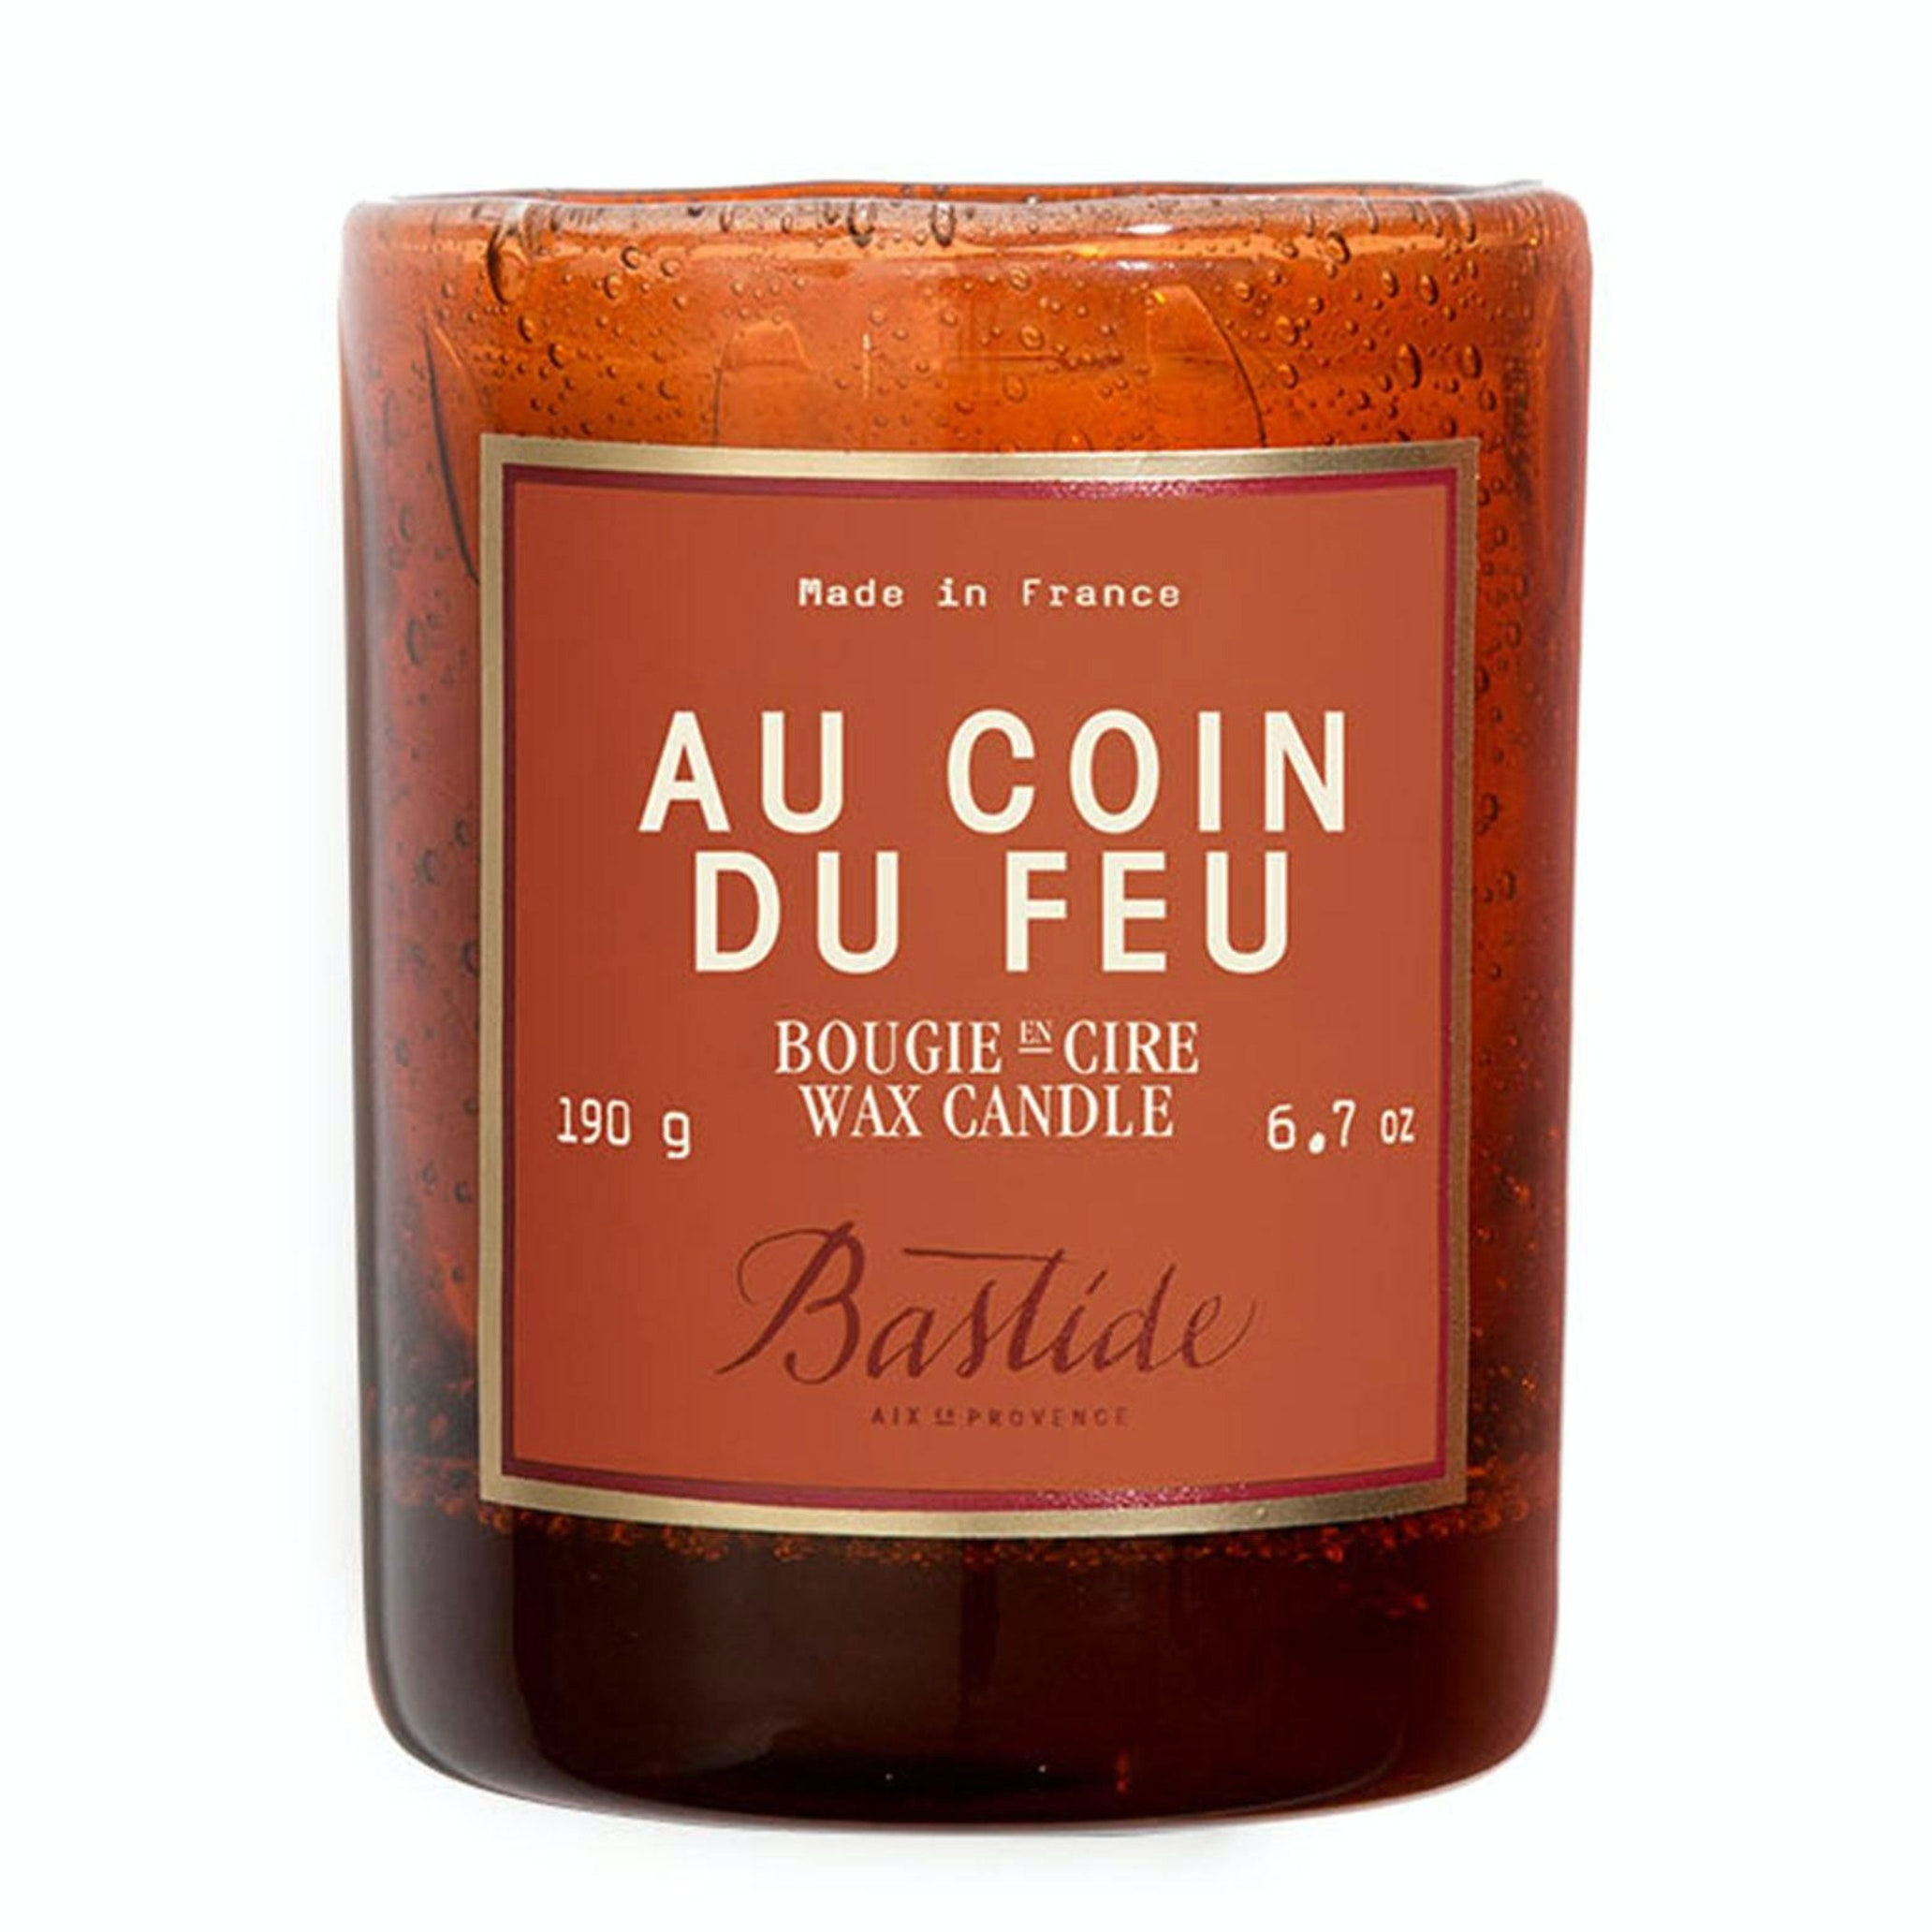 Bastide Au Coin du Feu Candle